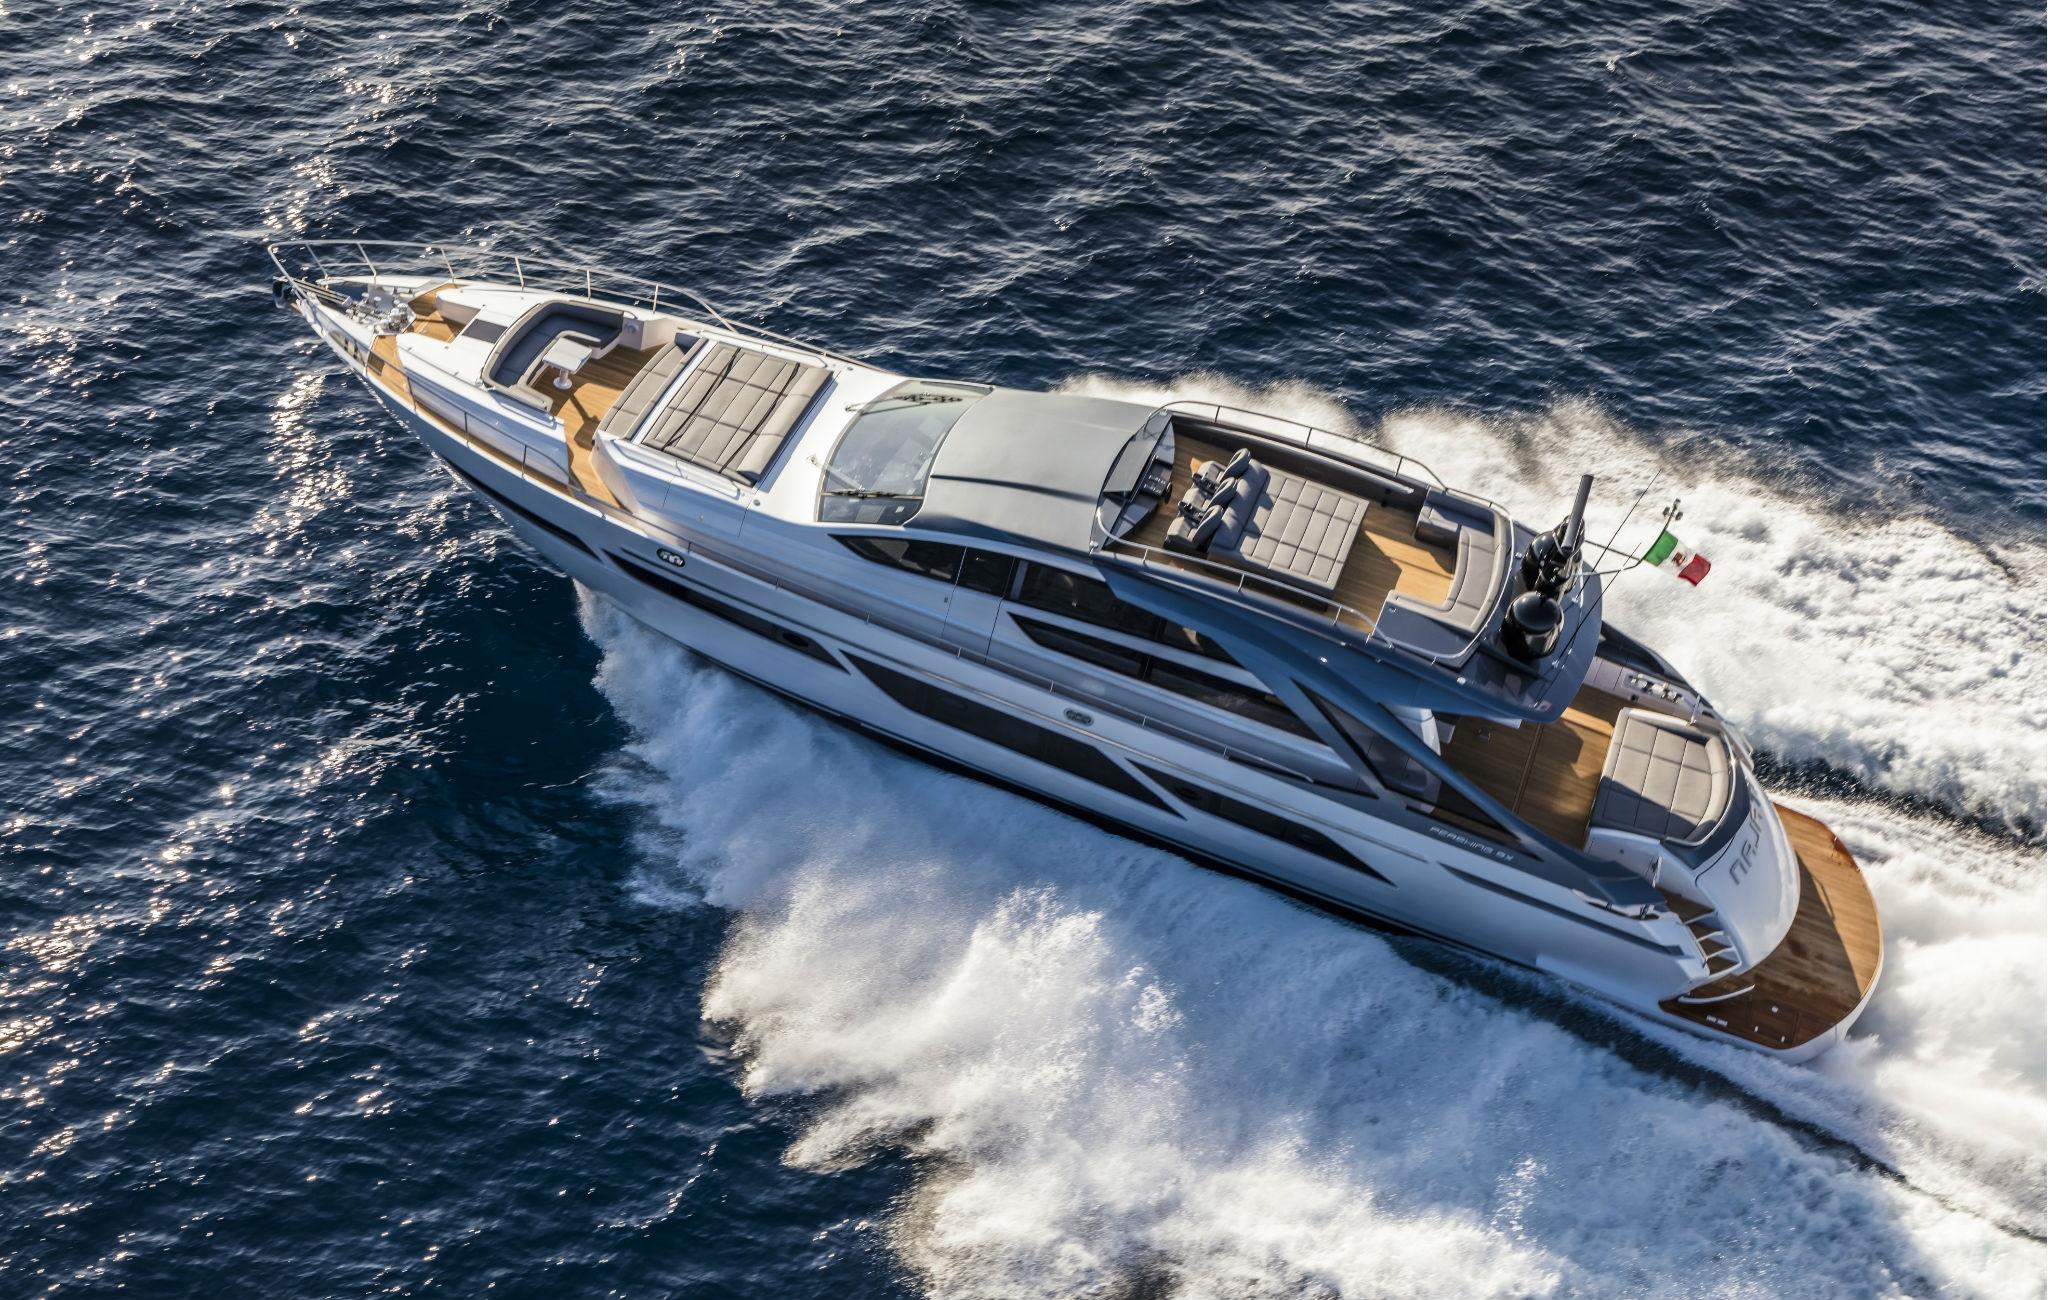 New Pershing 9X Ita Yachts Canada Ita Yachts Canada